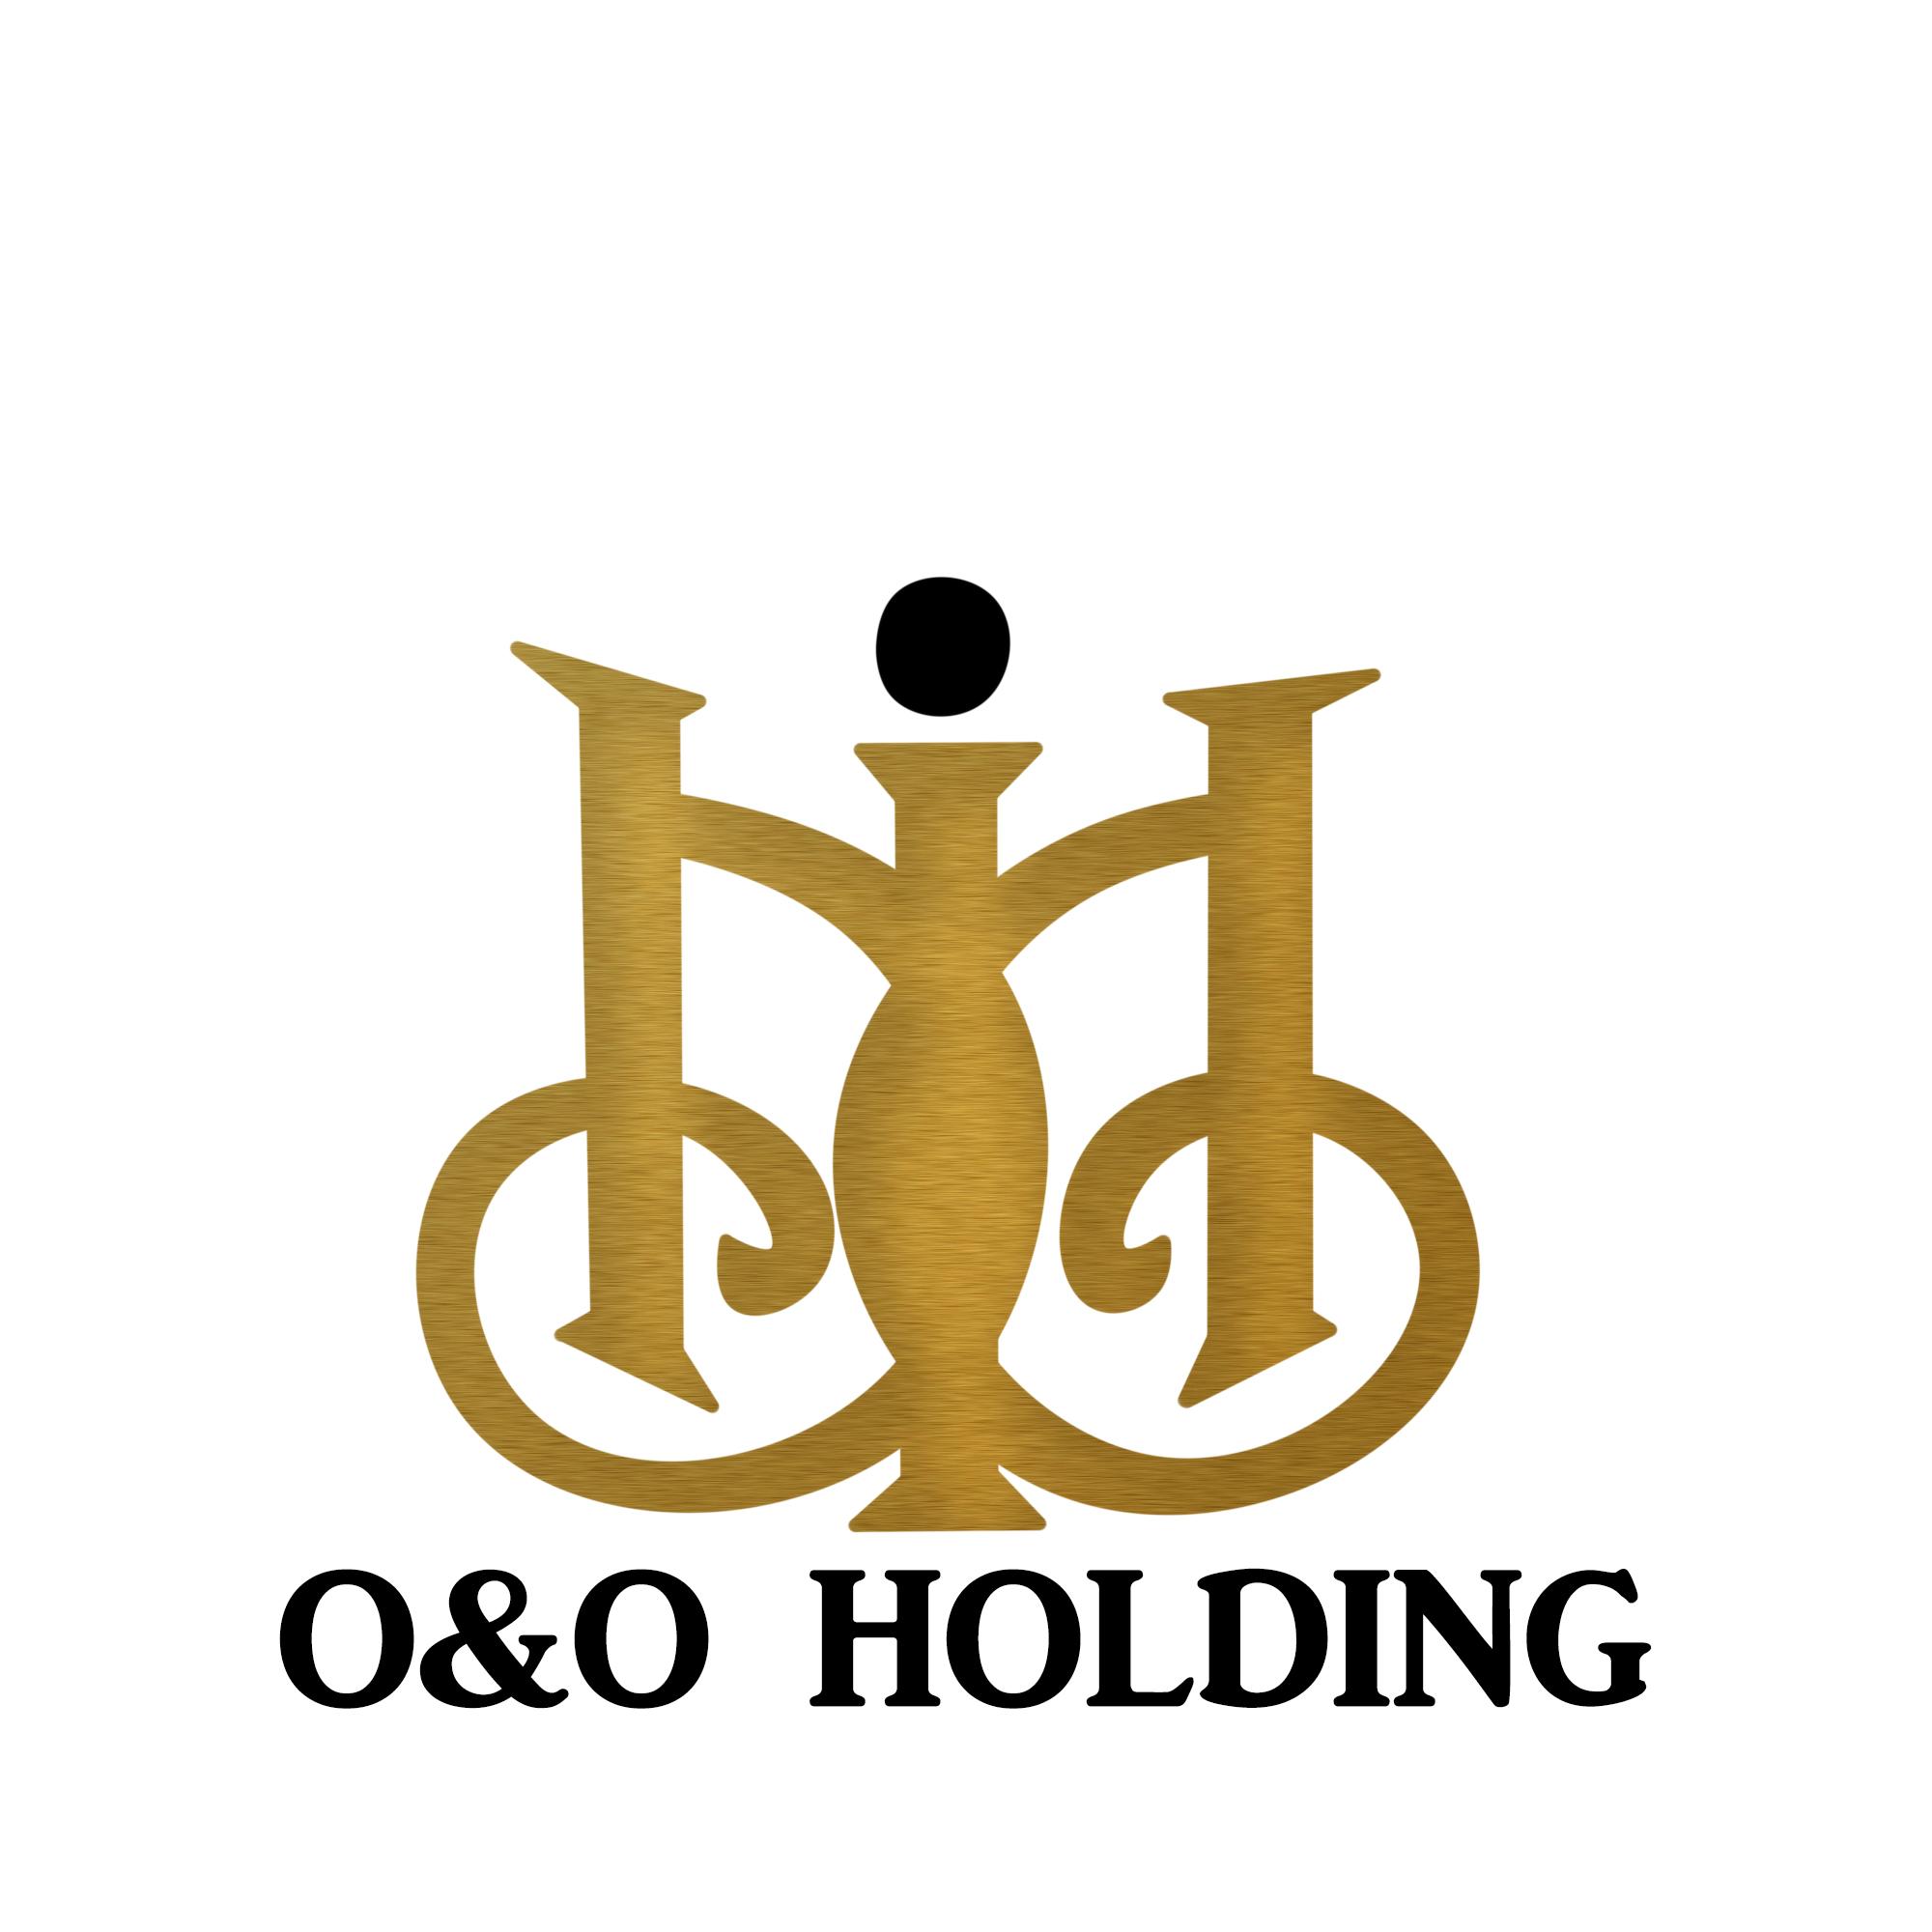 "Разработка Логотипа +  Фирменного знака для компании ""O & O HOLDING"" фото f_8585c7abc40ac620.jpg"